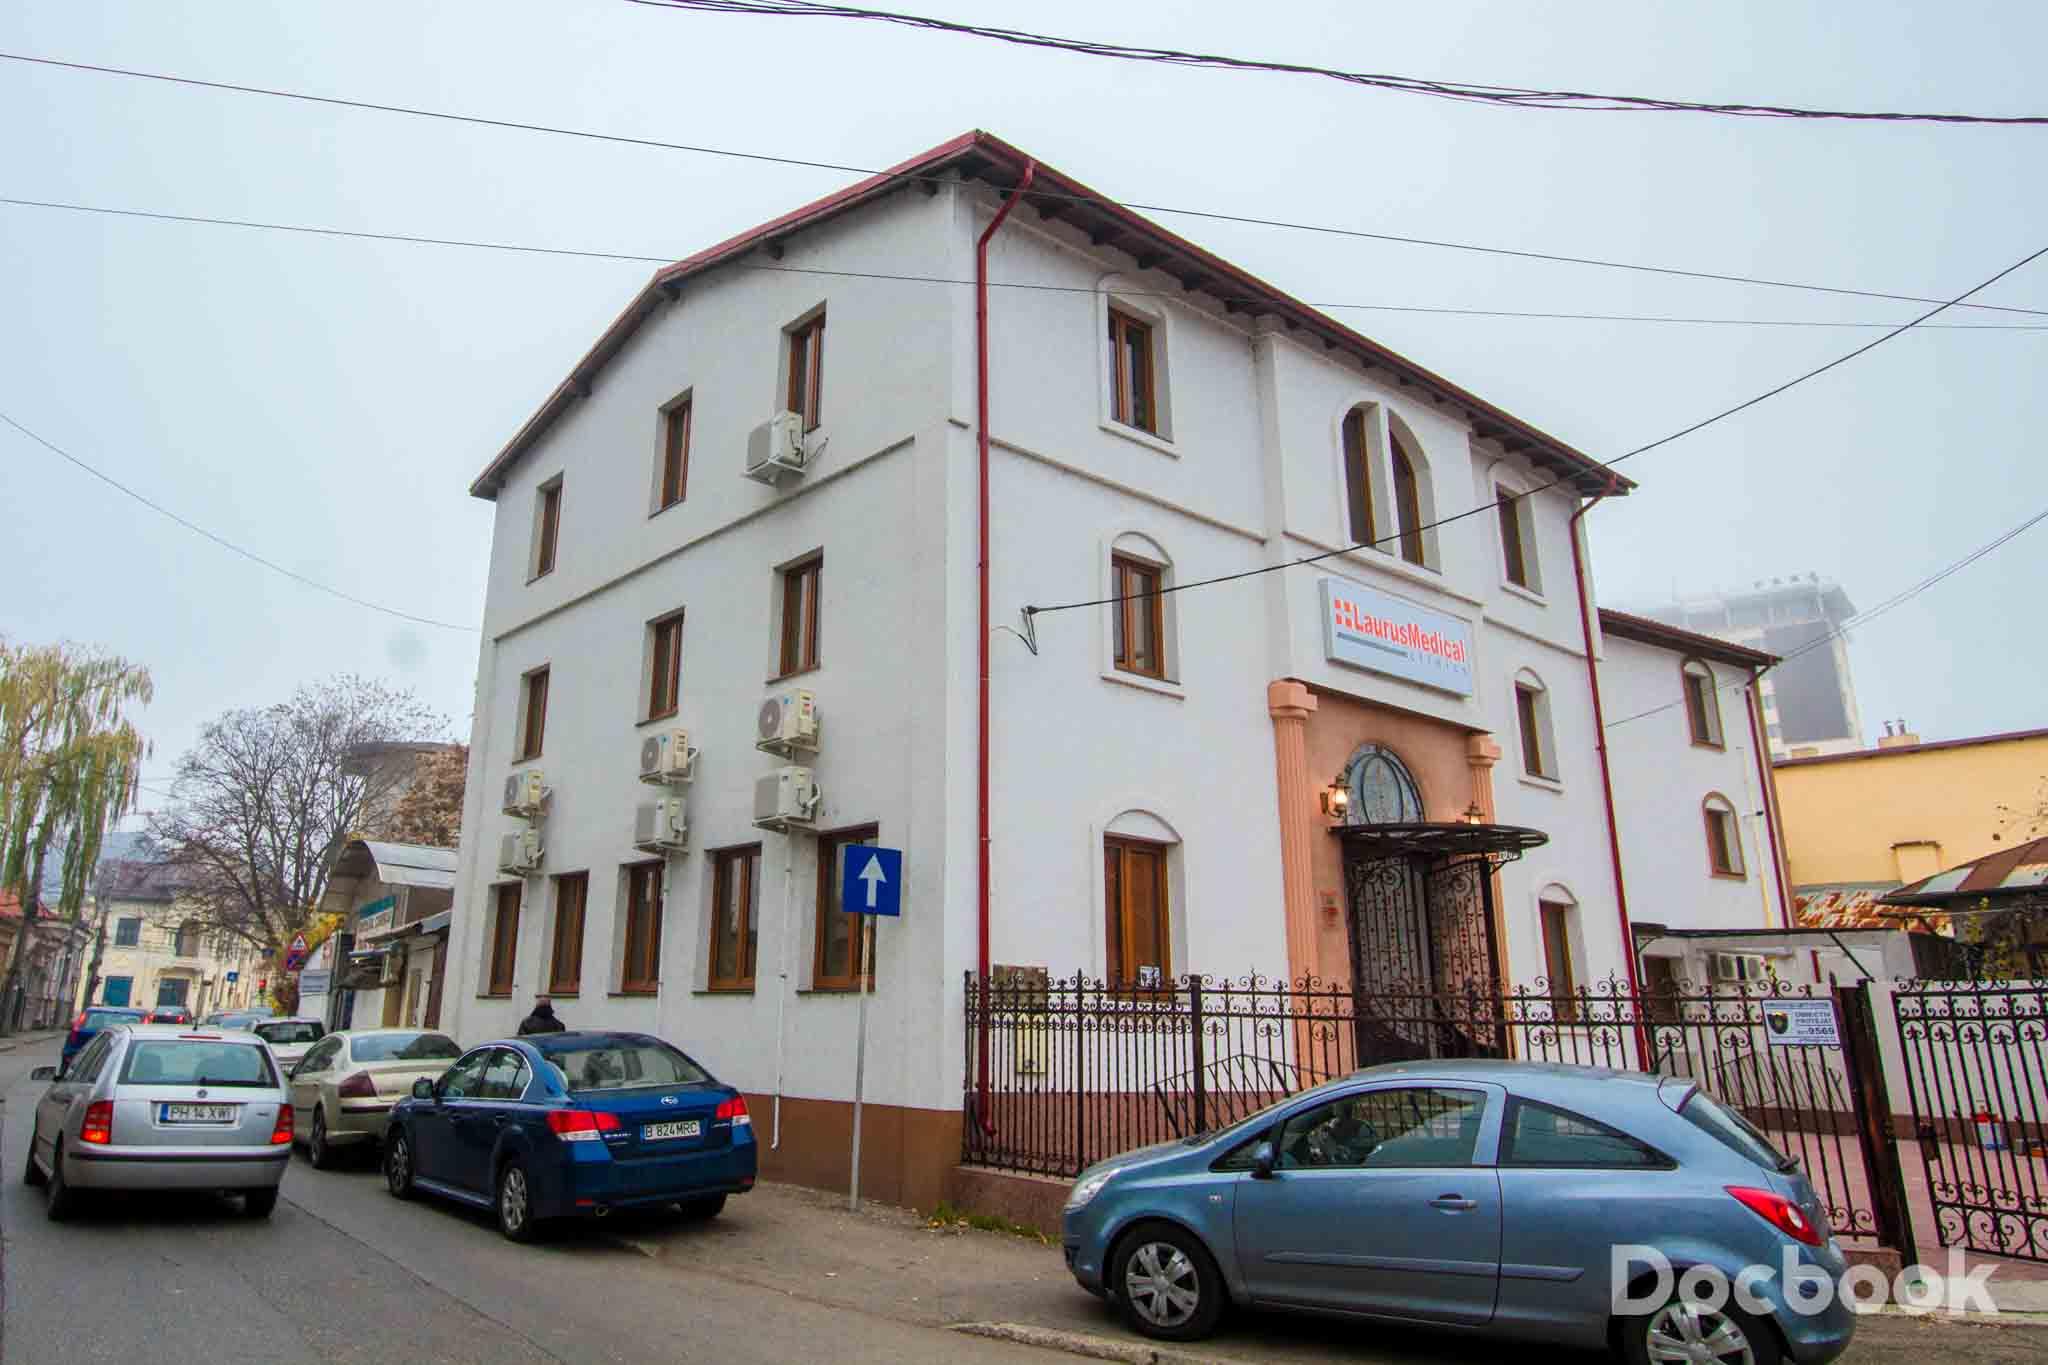 Clinica LaurusMedical Ploiesti